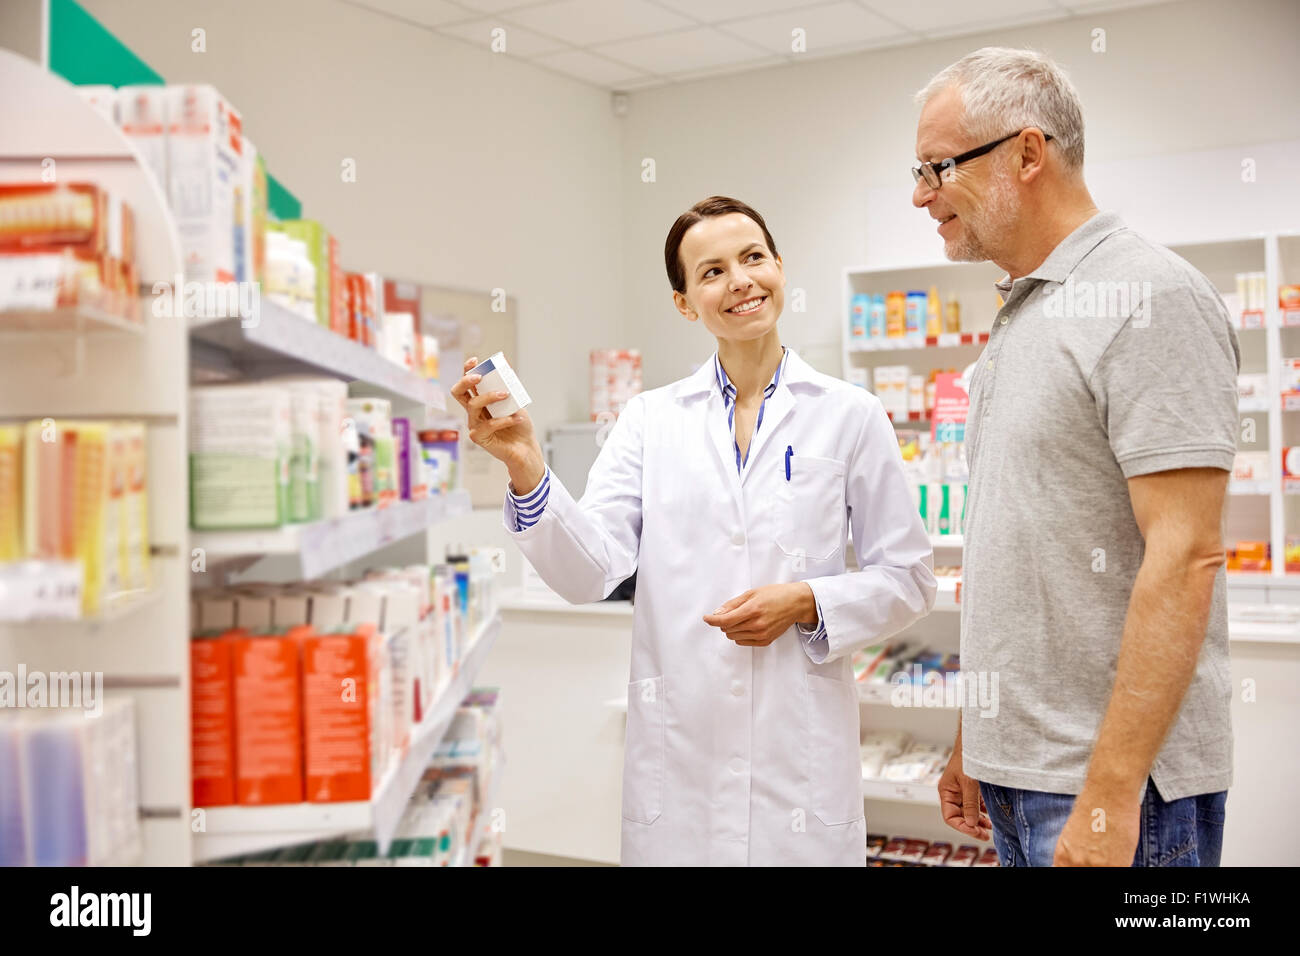 pharmacist showing drug to senior man at pharmacy - Stock Image